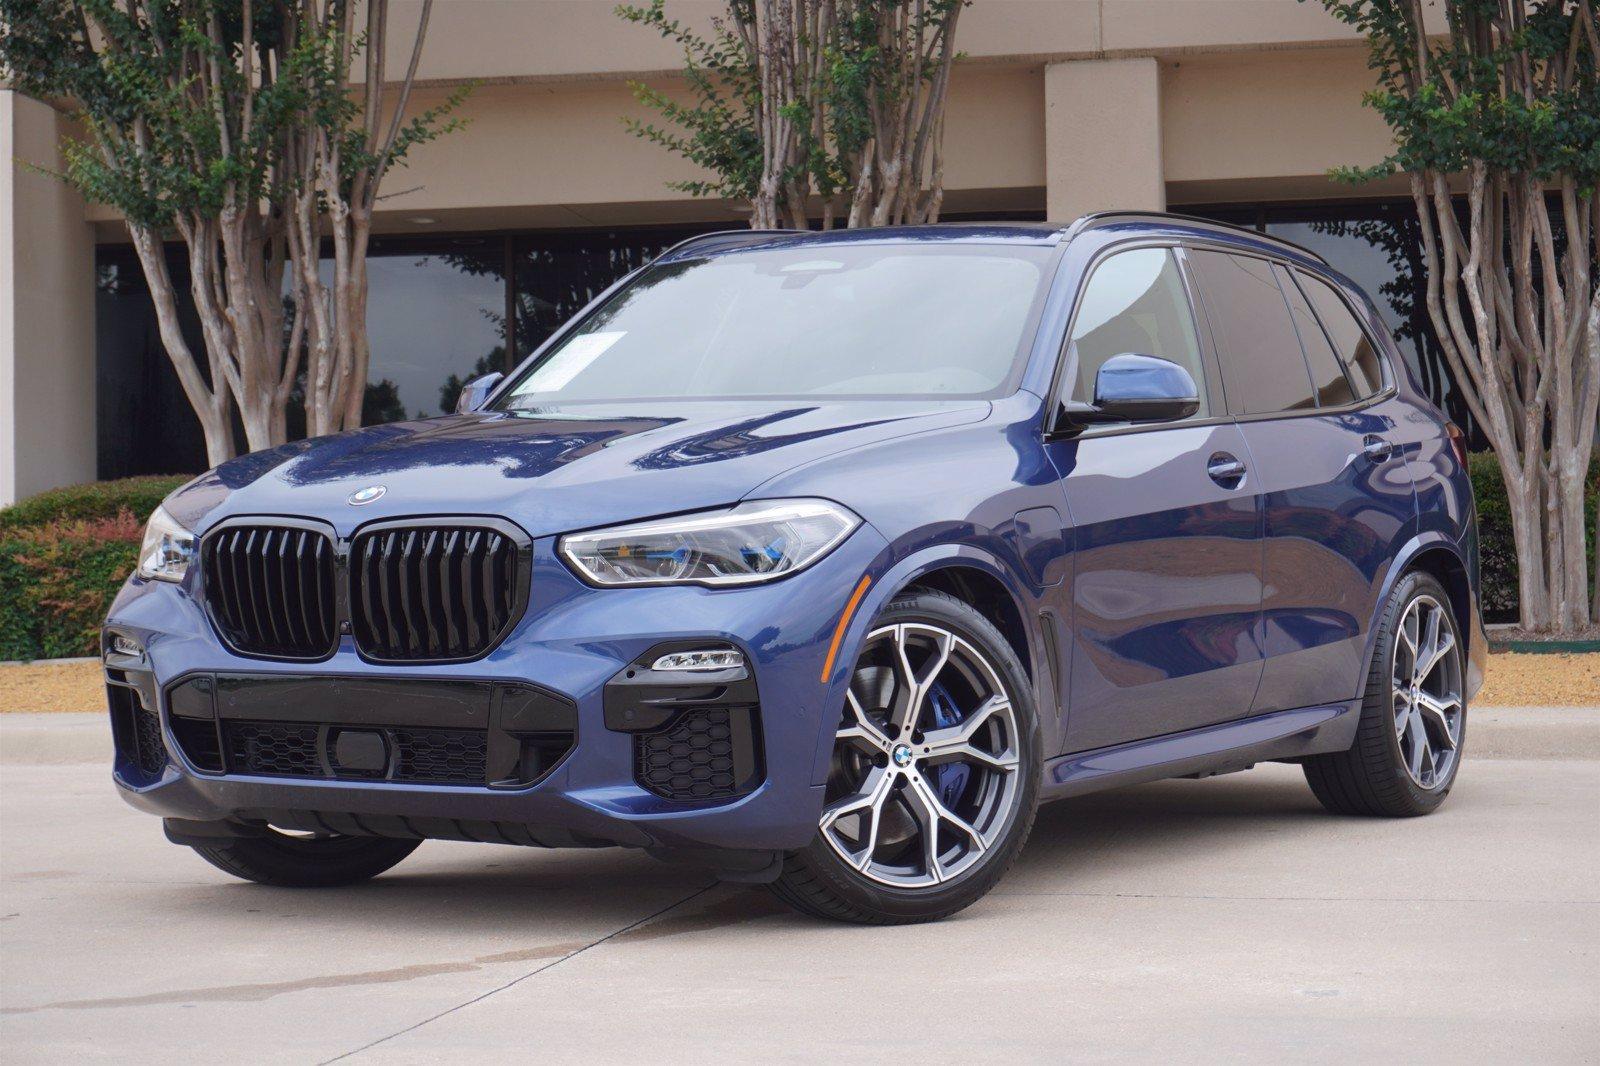 2021 BMW X5 xDrive45e Vehicle Photo in Grapevine, TX 76051